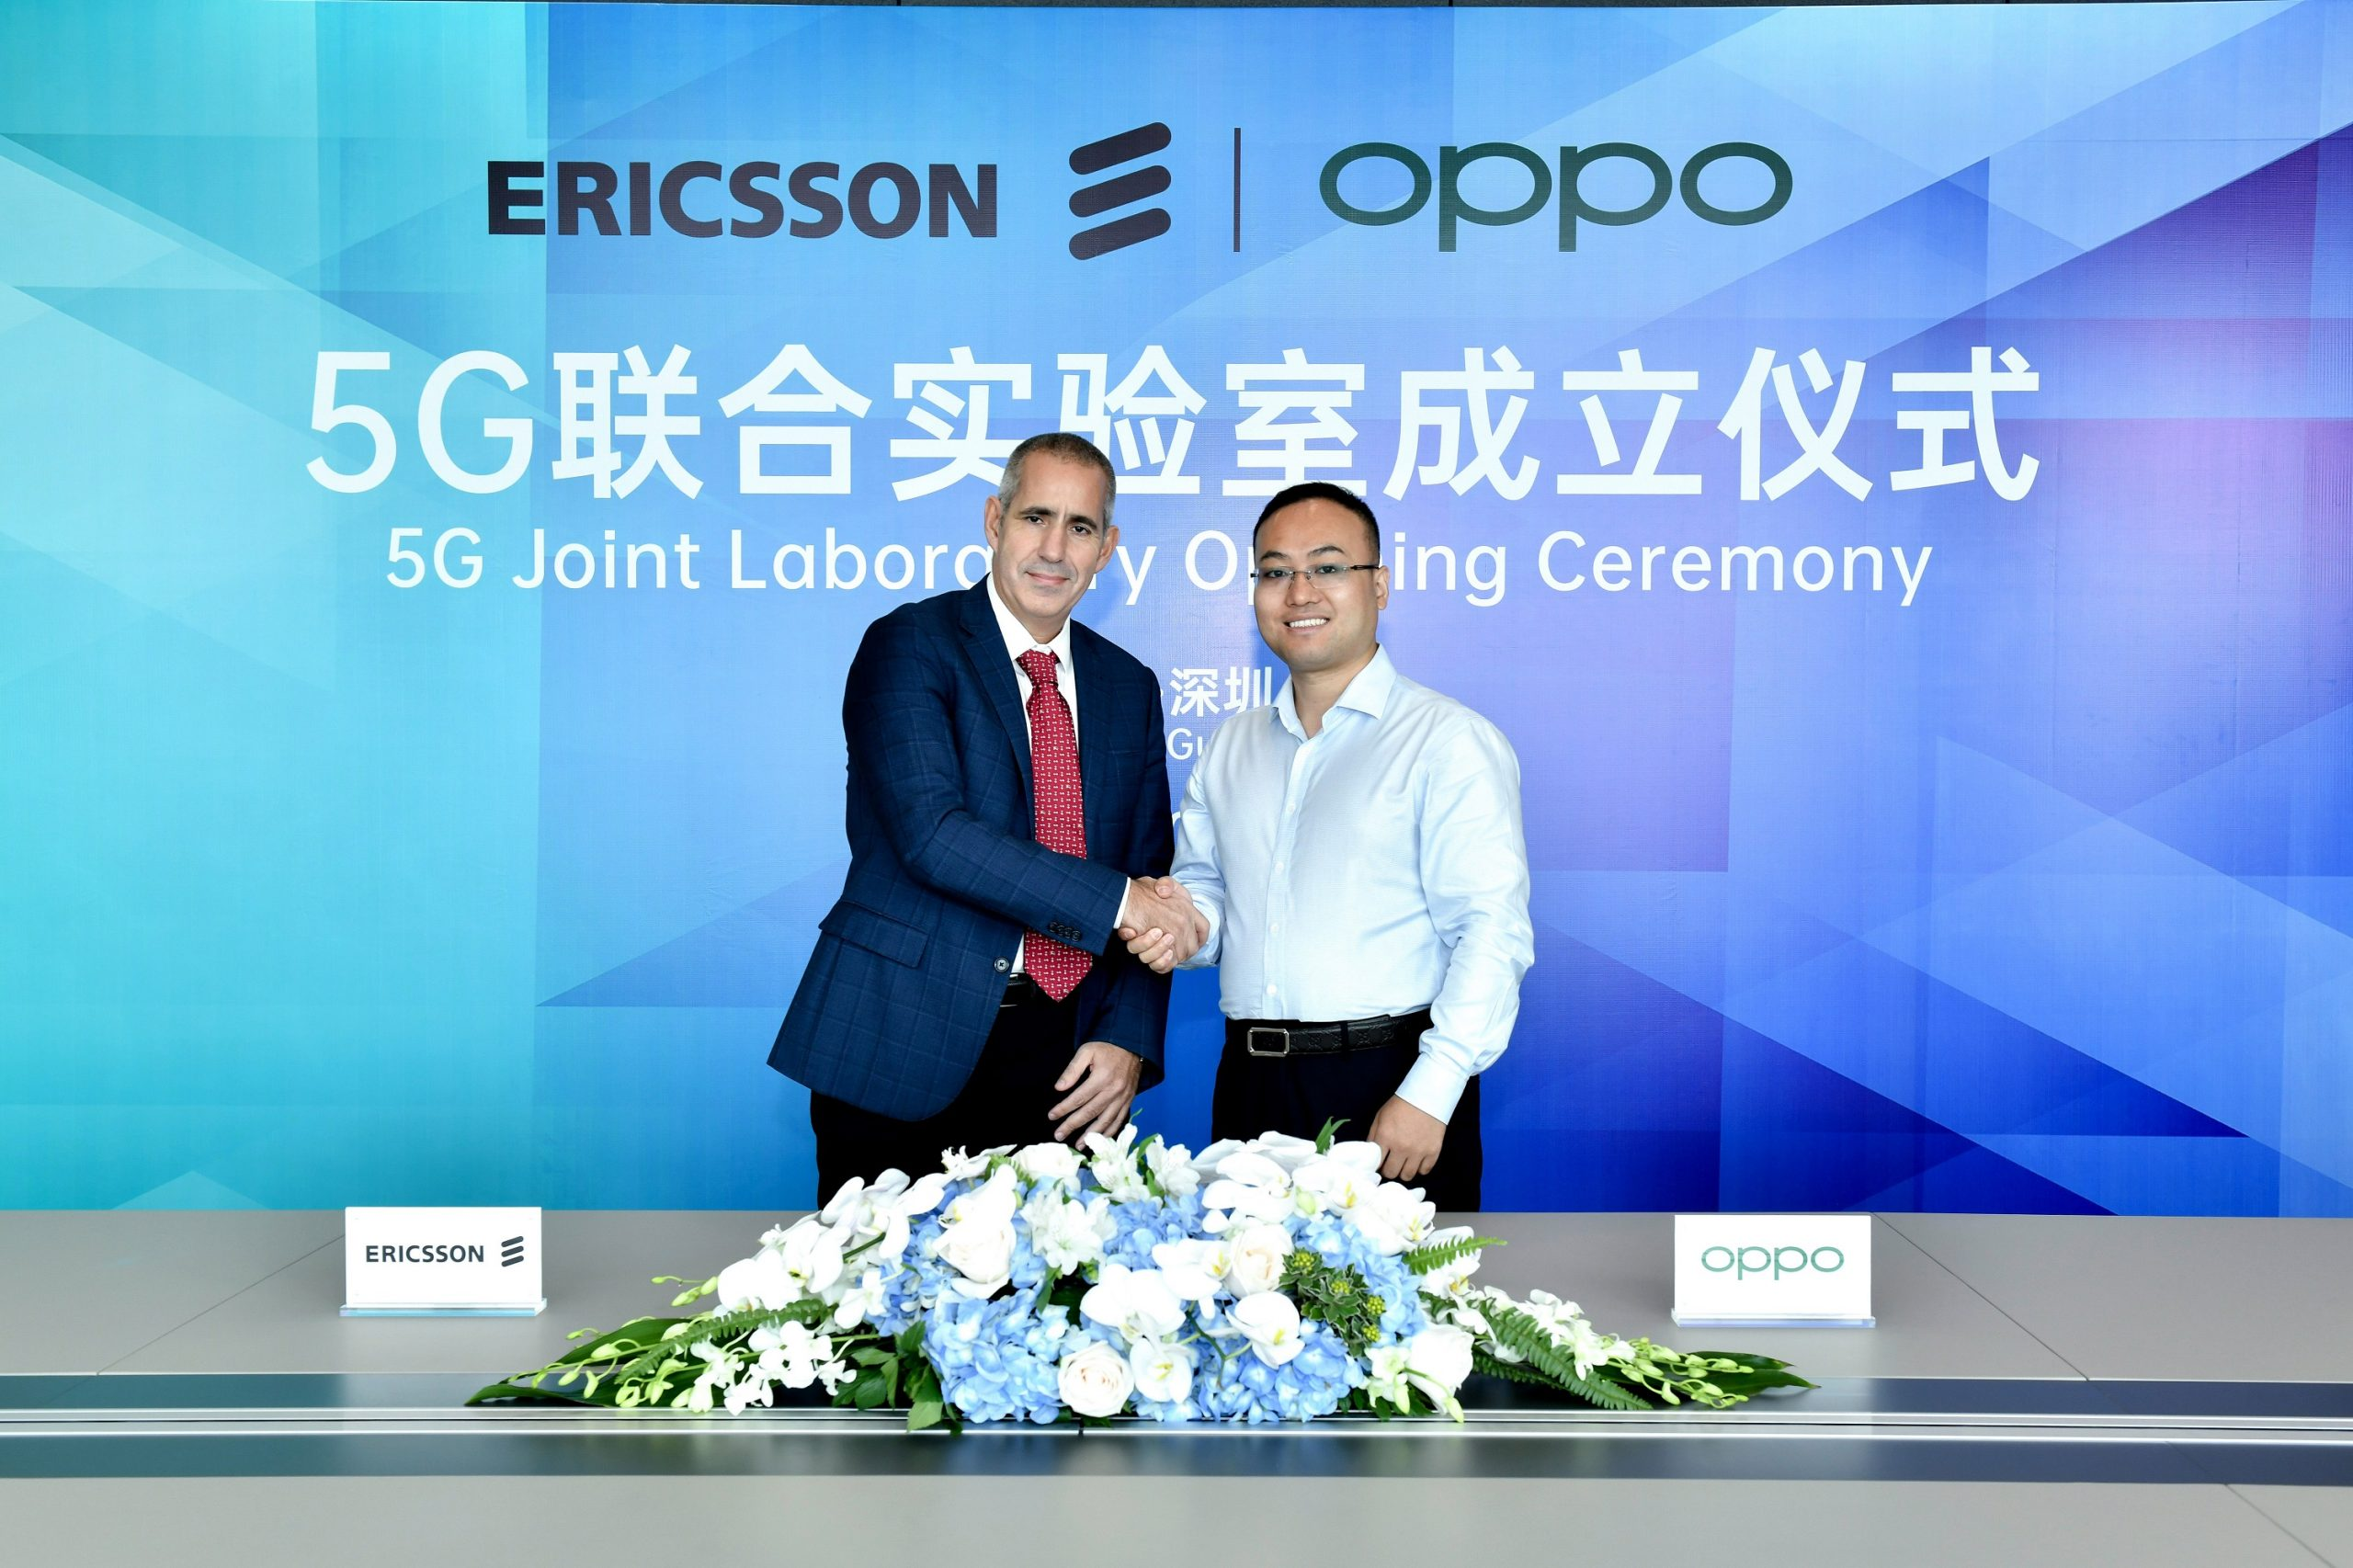 Oppo Ericsson partnership